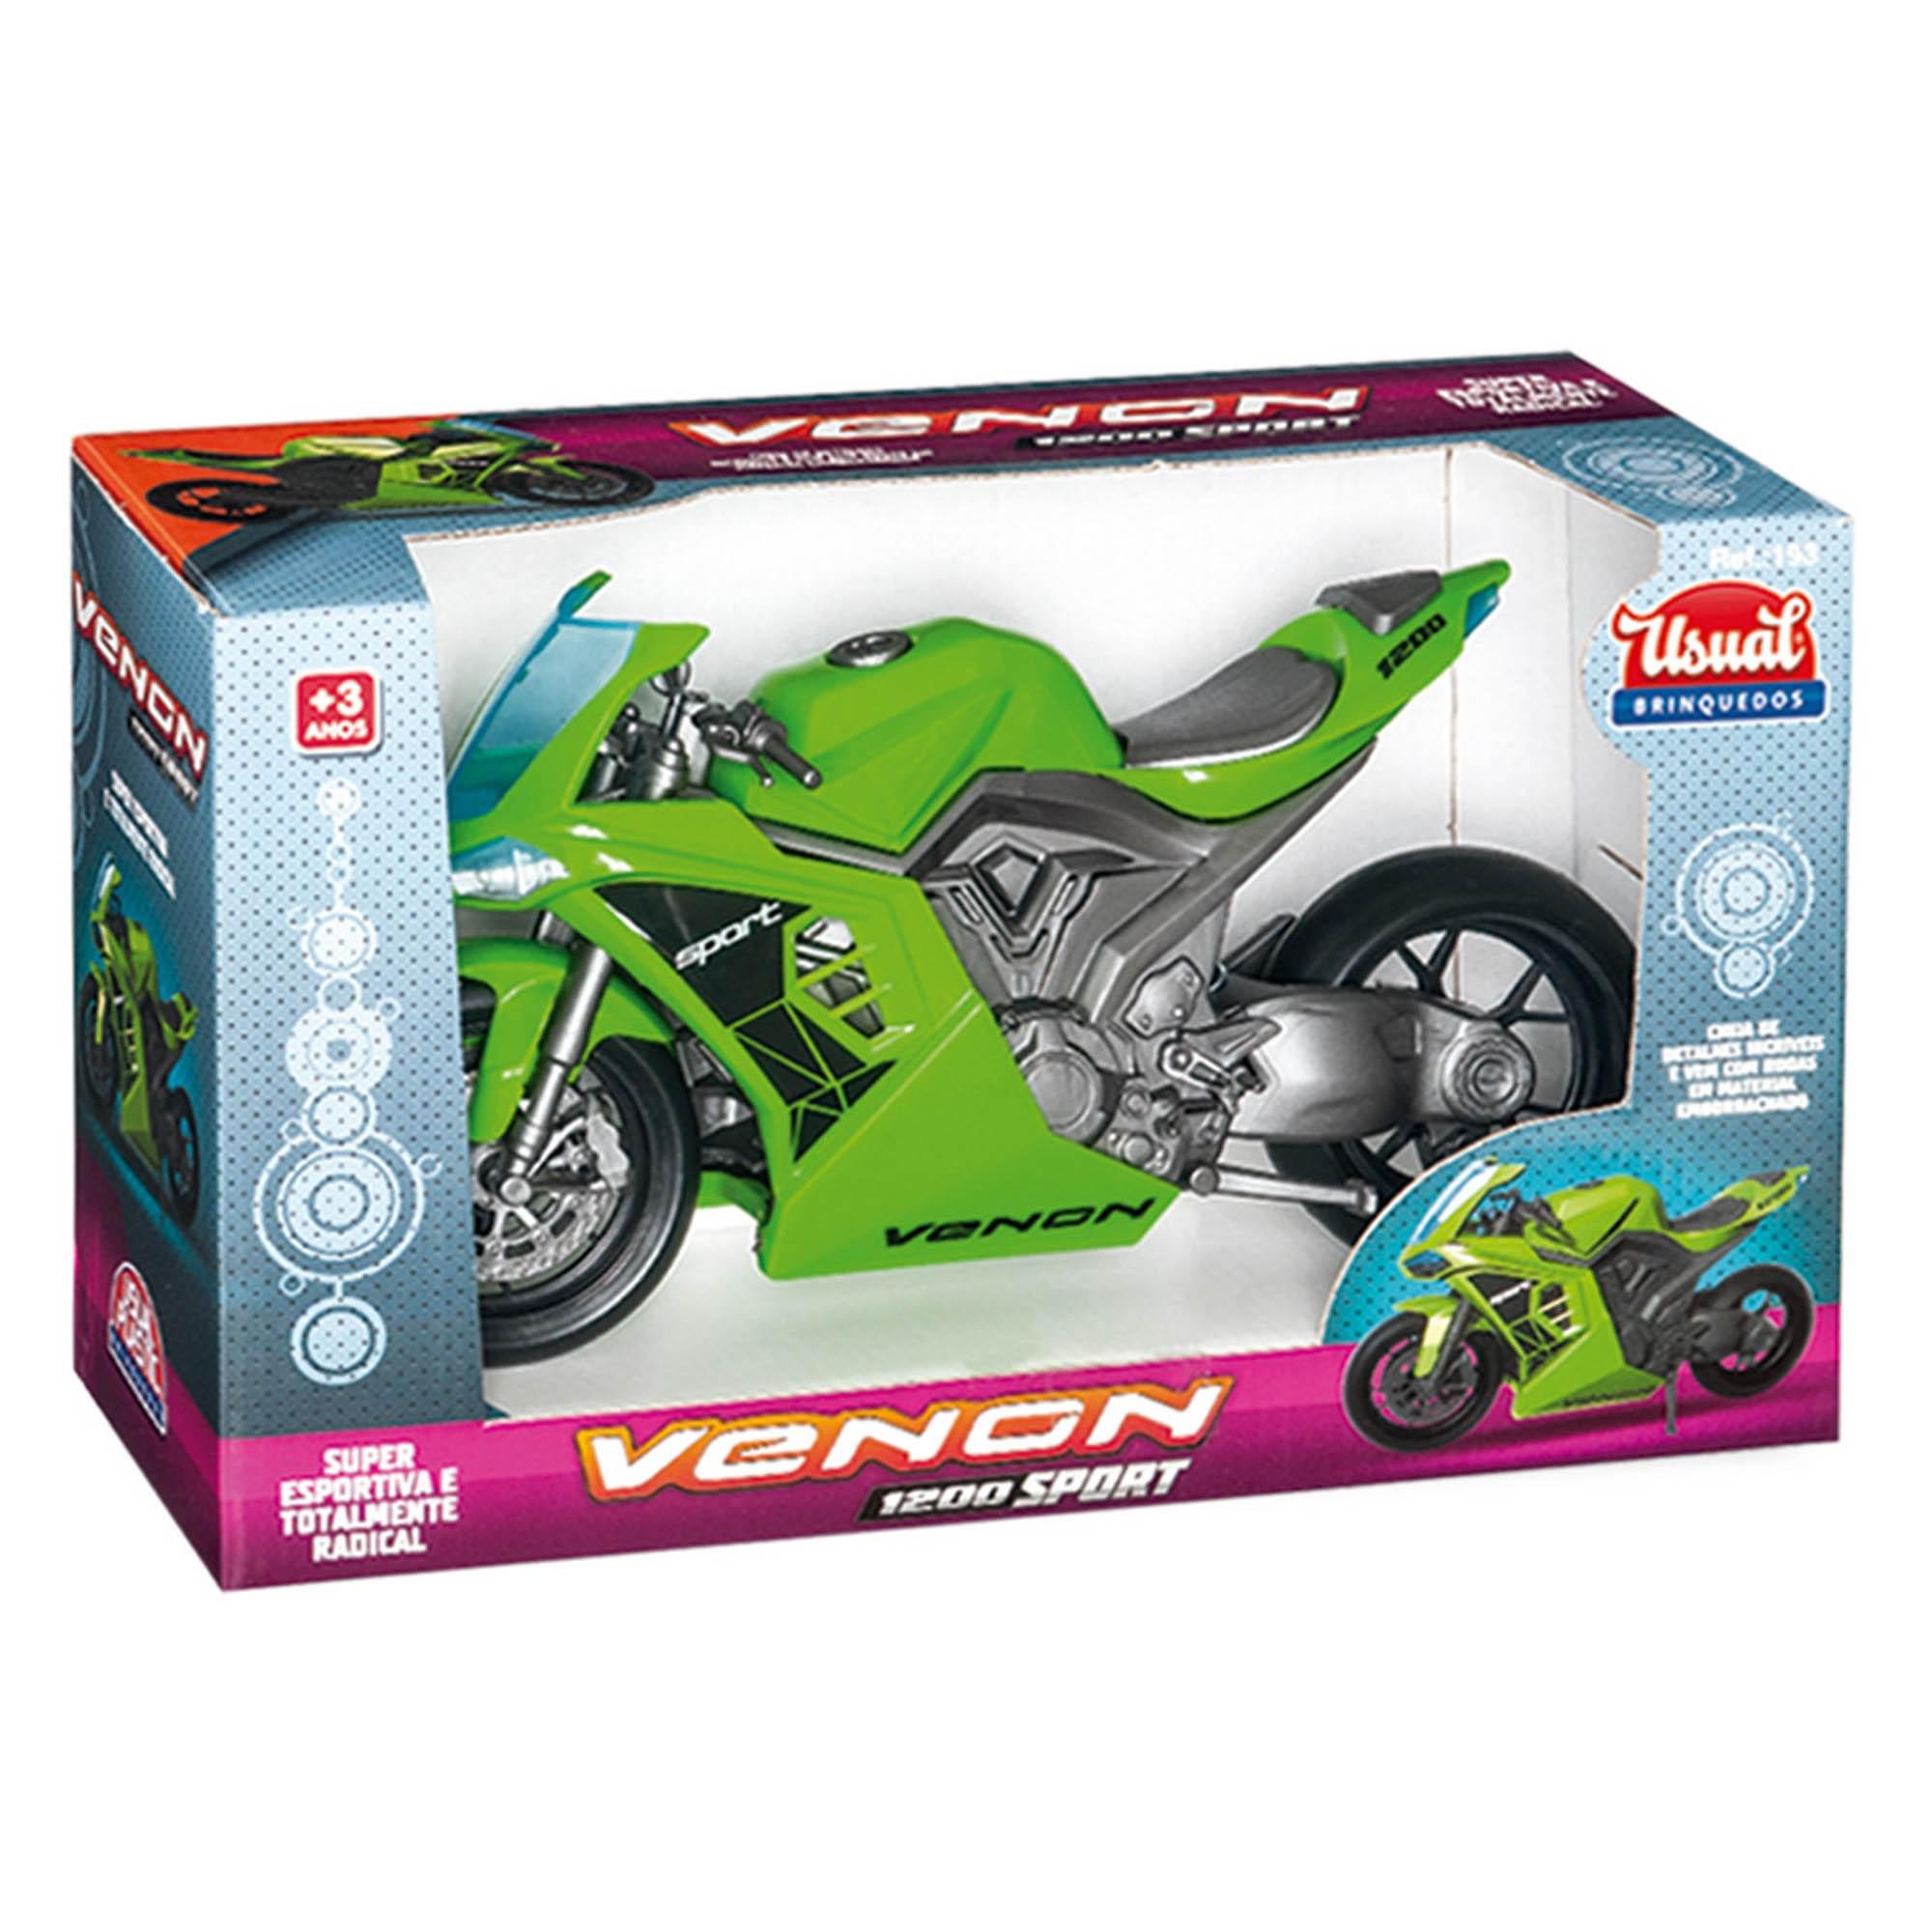 Moto Venon 1200 Sport Verde - Usual Brinquedos